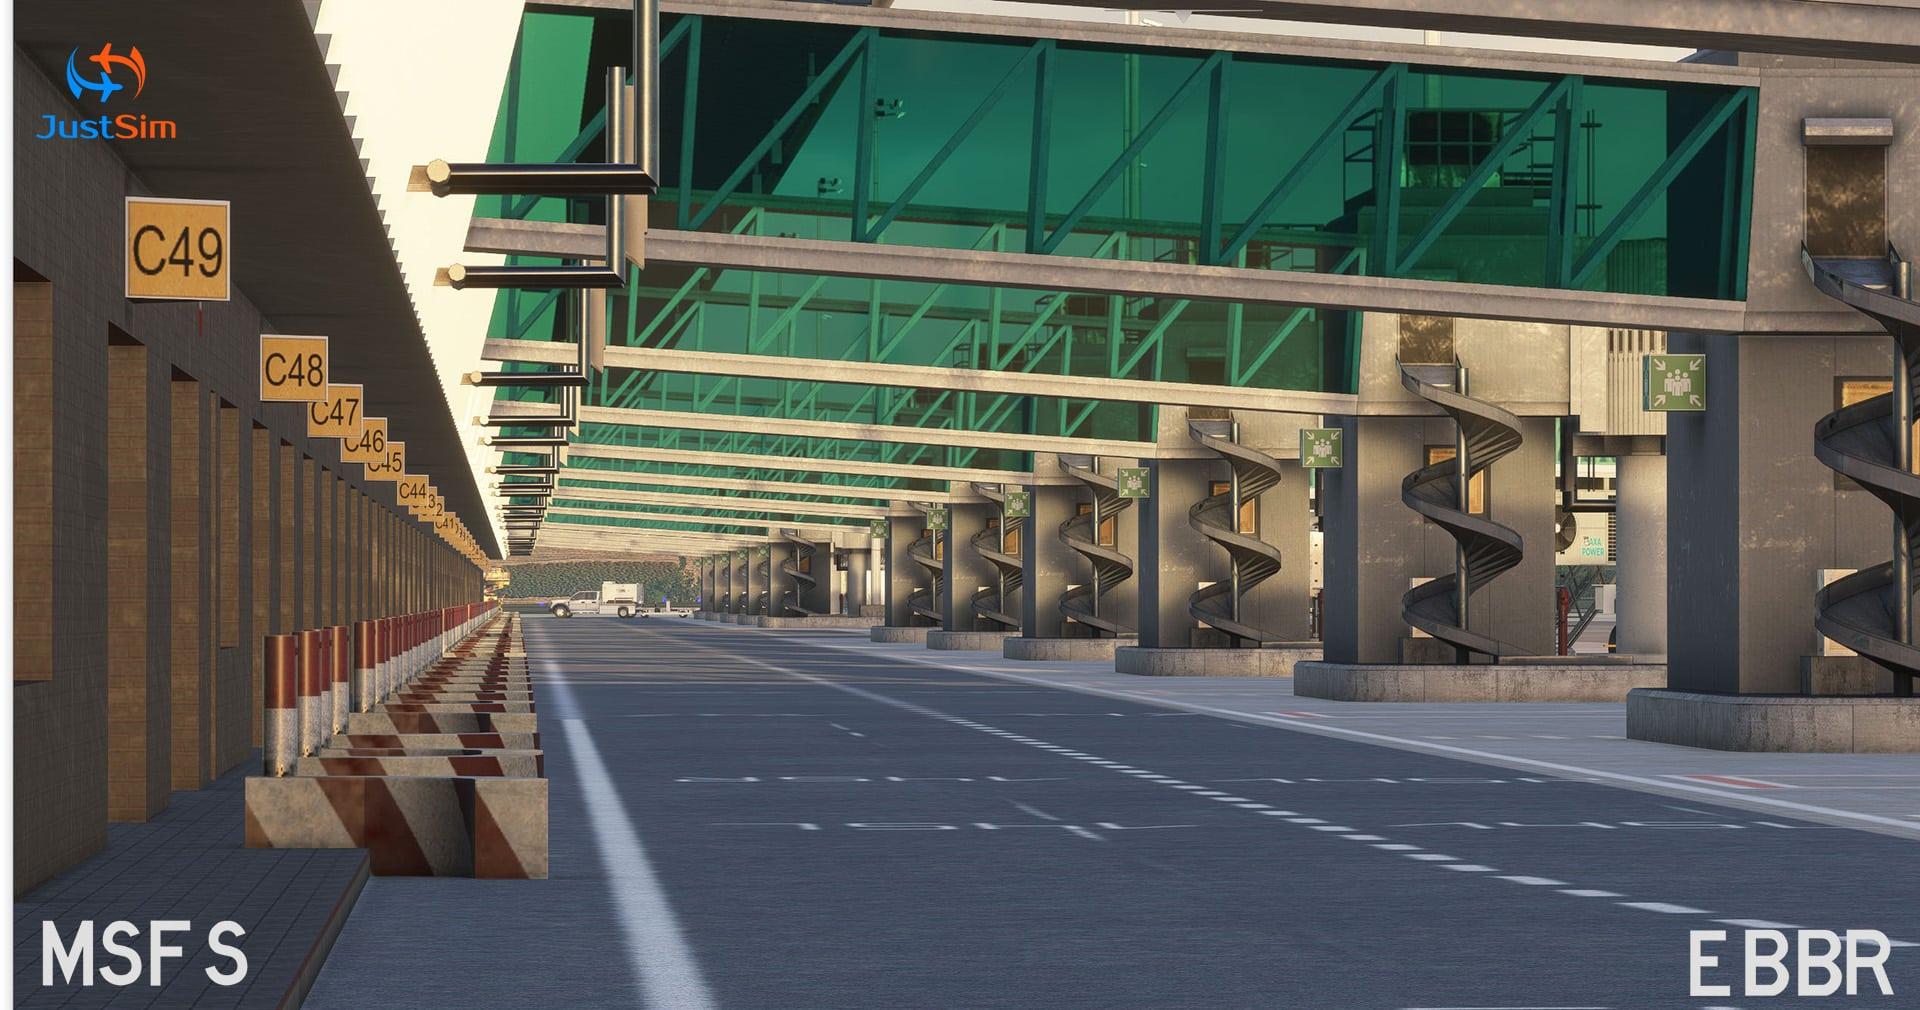 JustSim – EBBR Brussels Airport MSFS